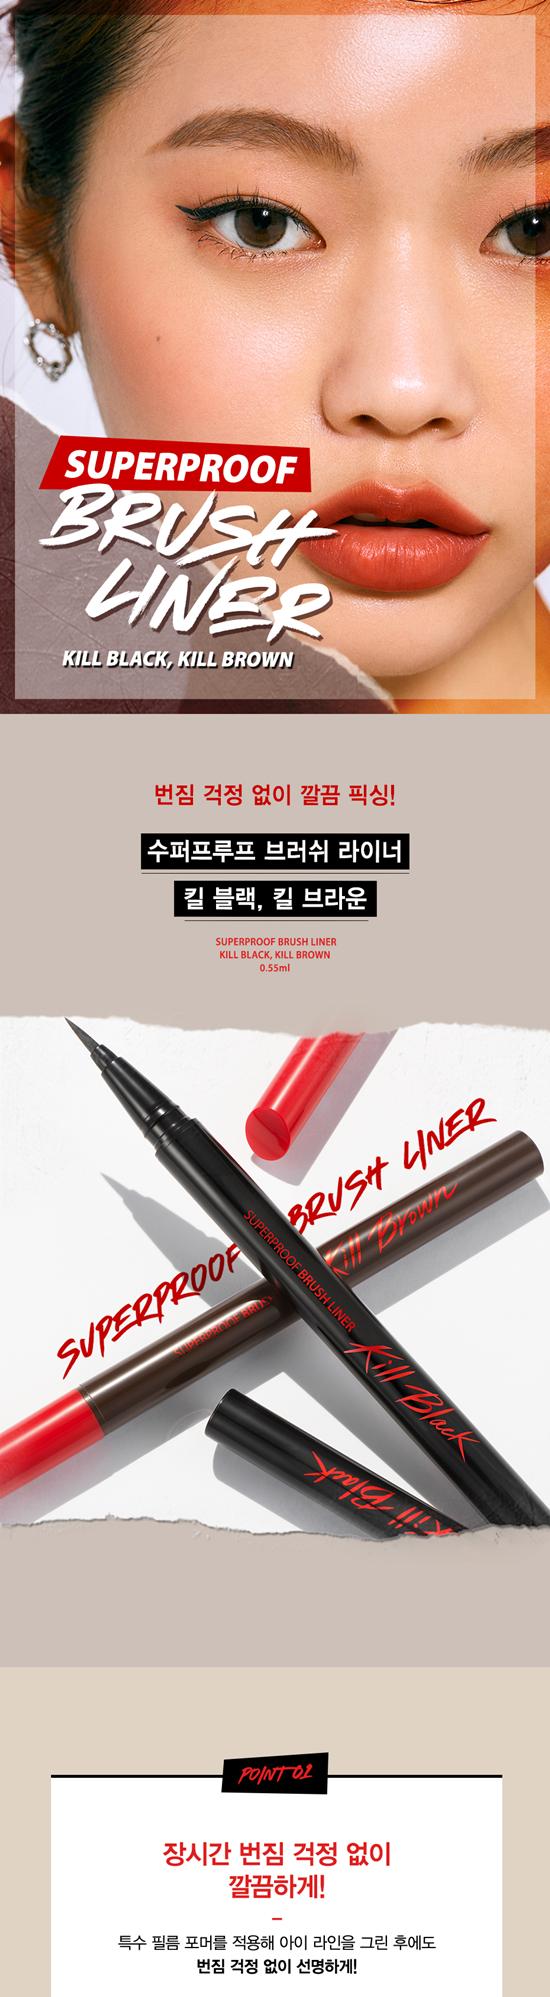 clio-superproof-brush-liner-info1.png